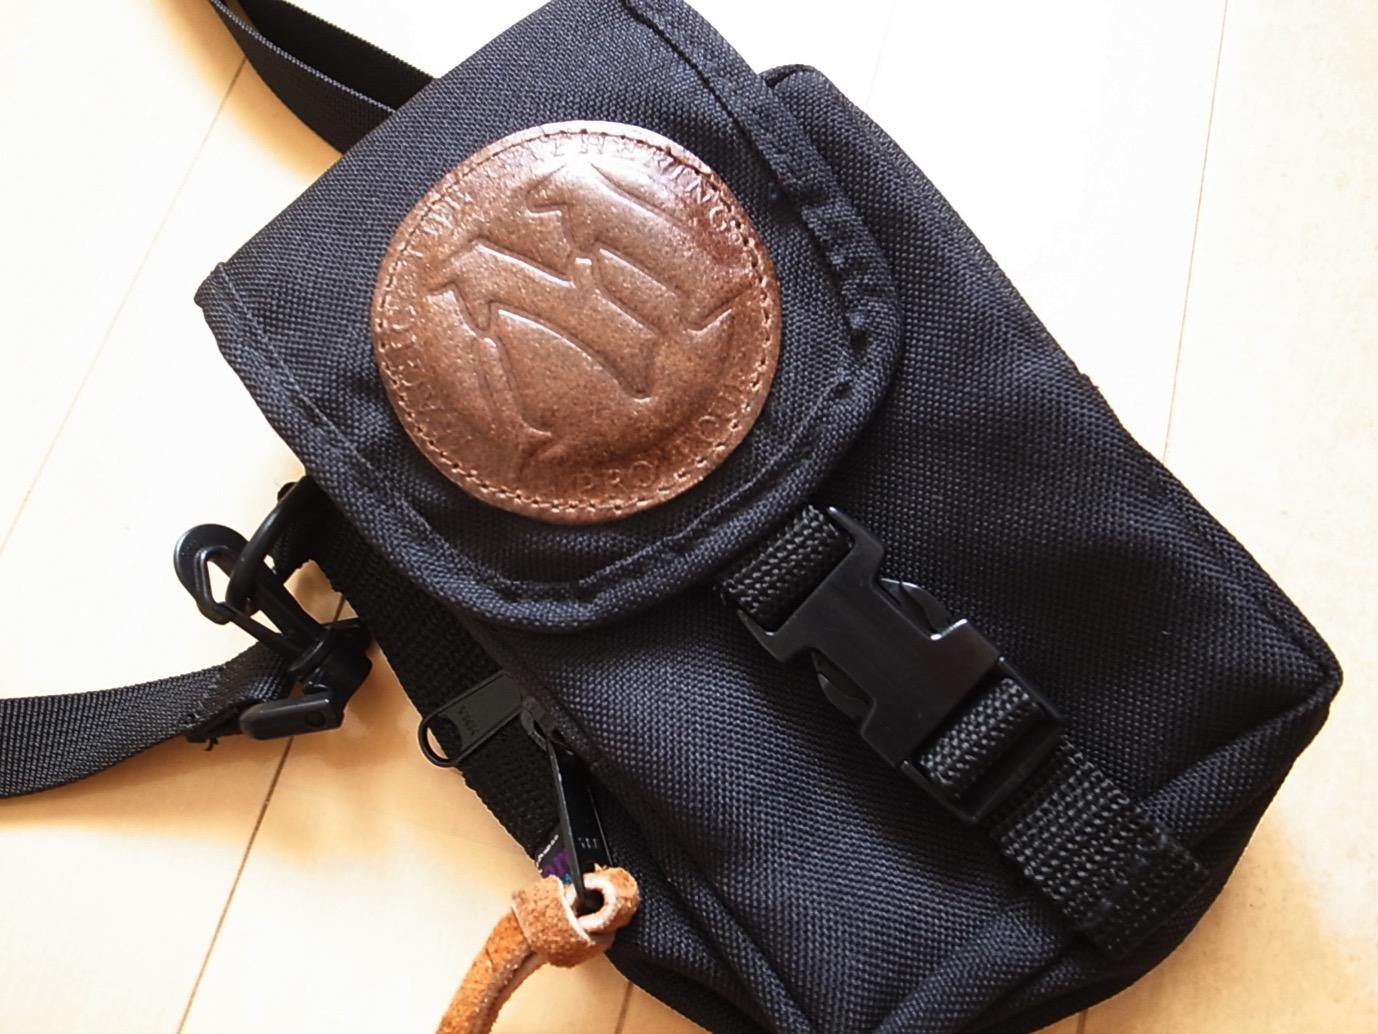 Mtg bag 5